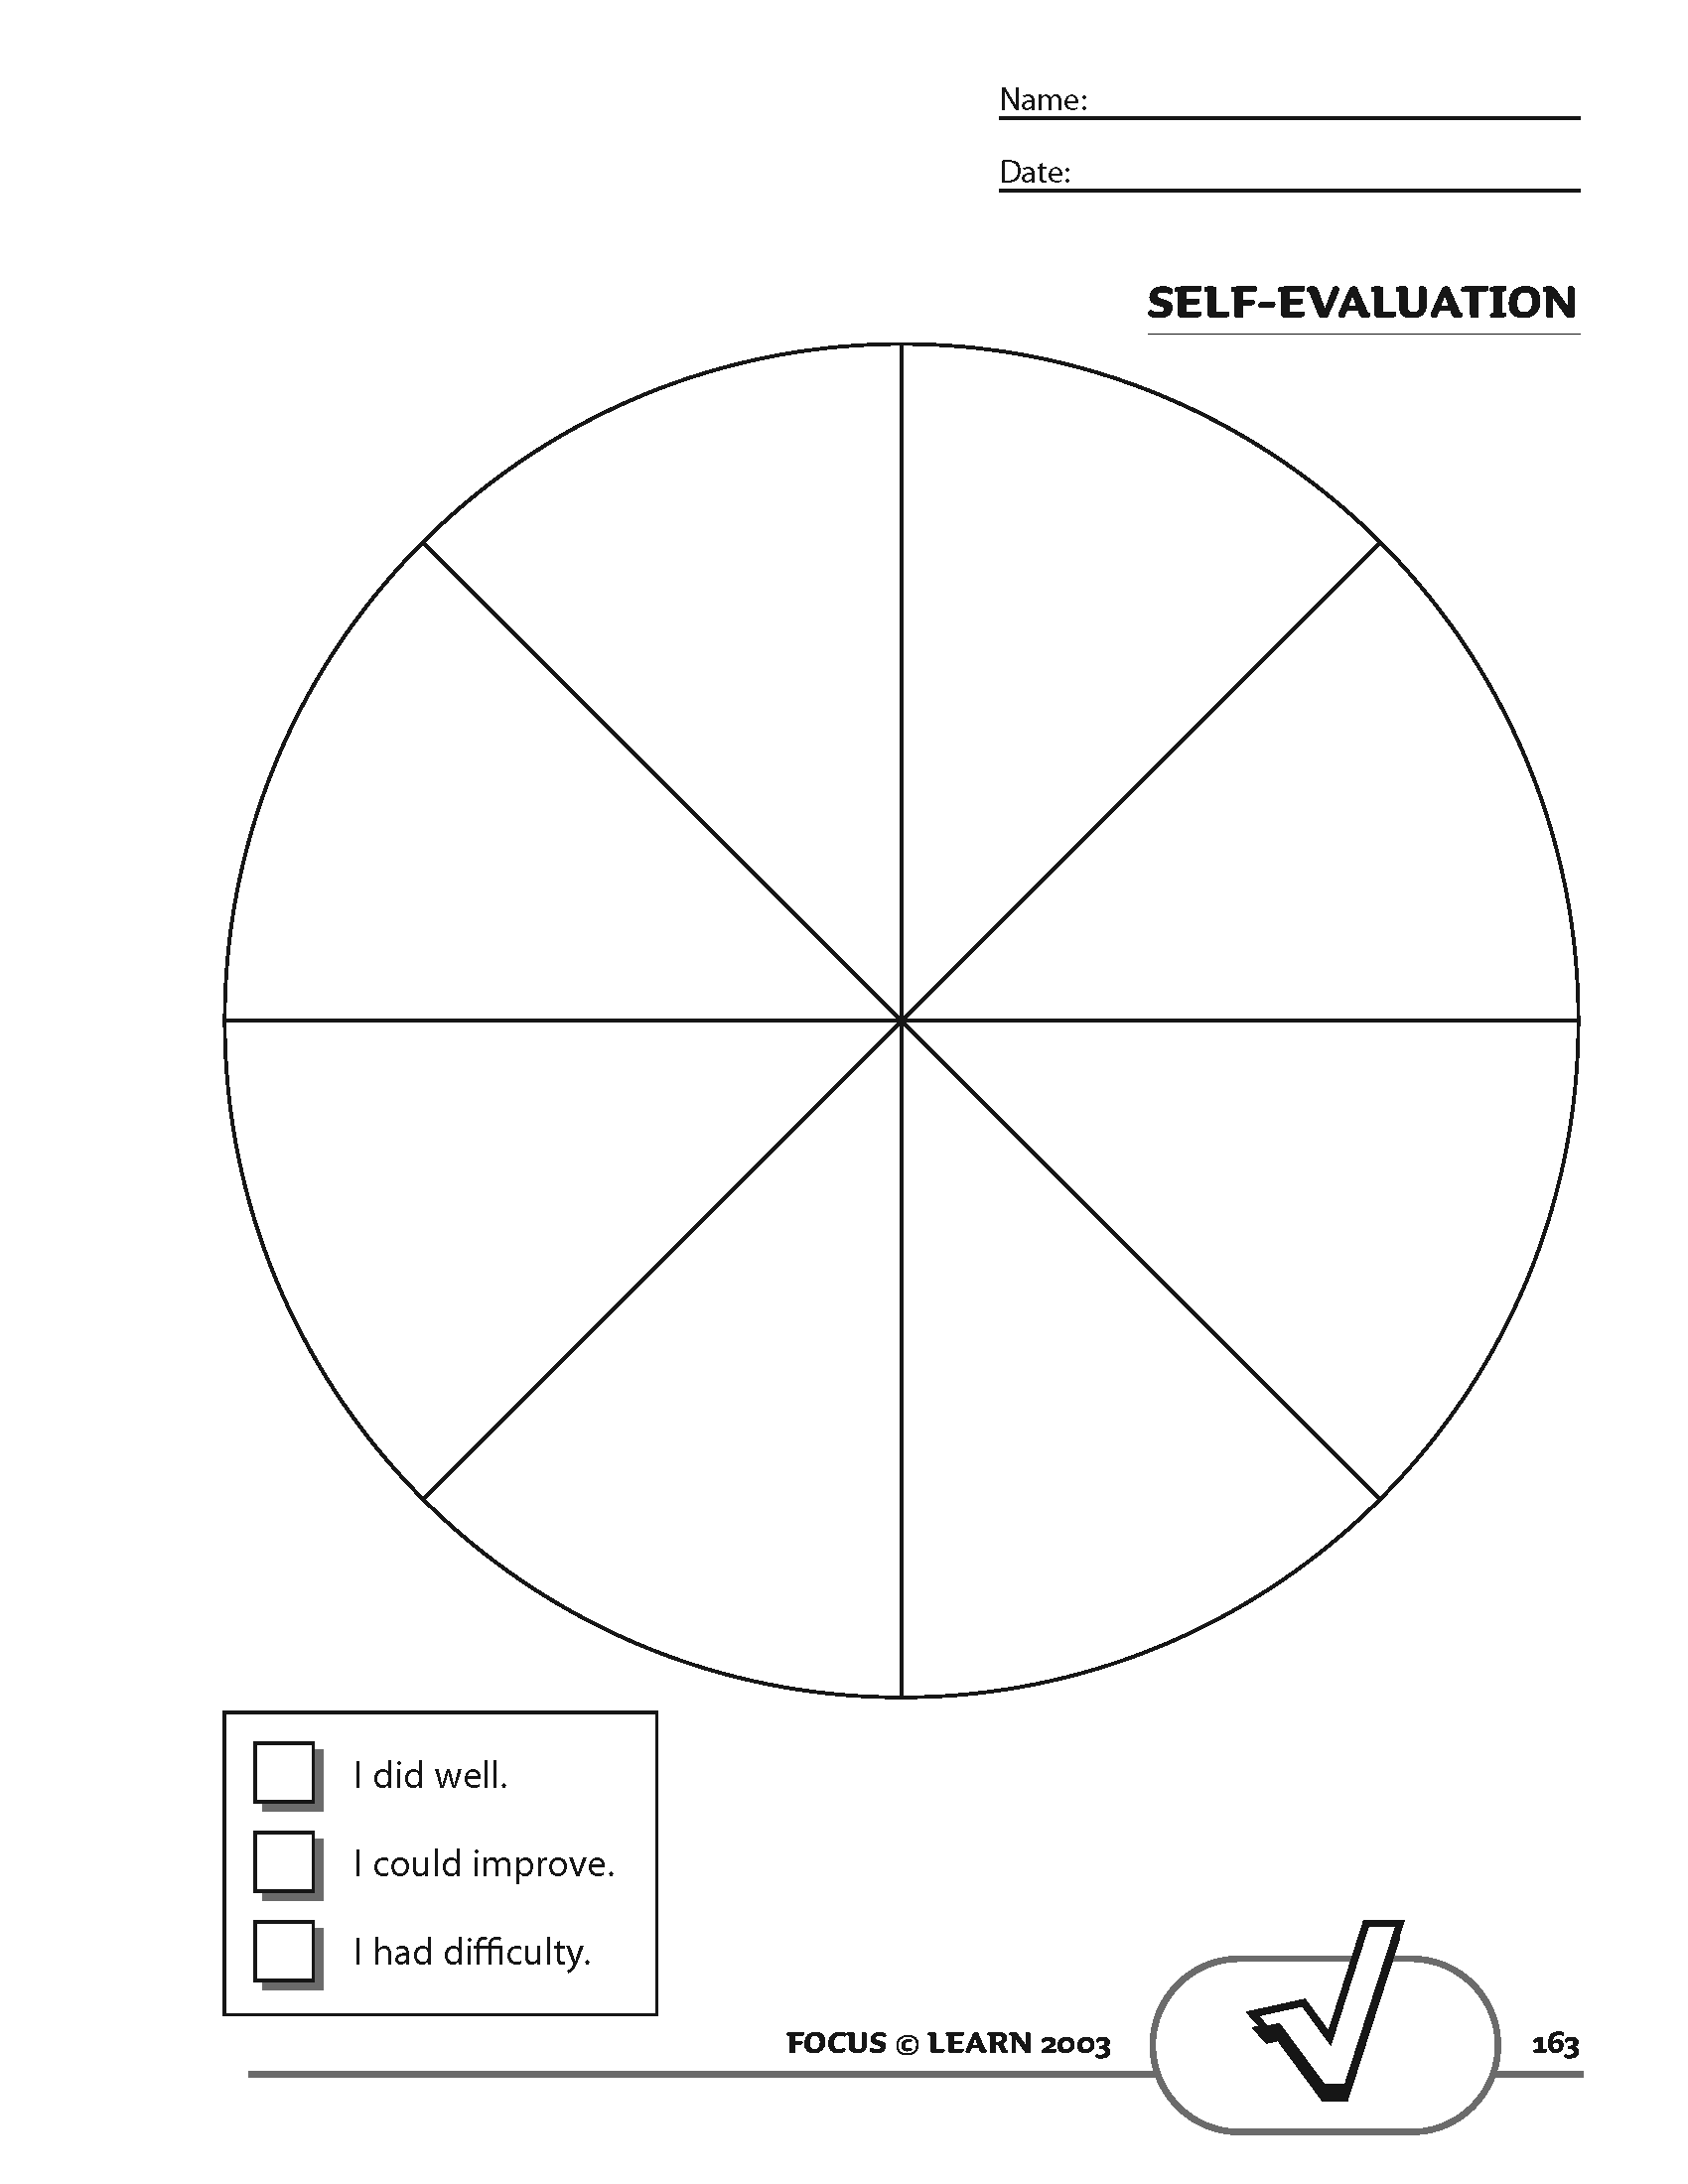 Self-Evaluation Pie Chart